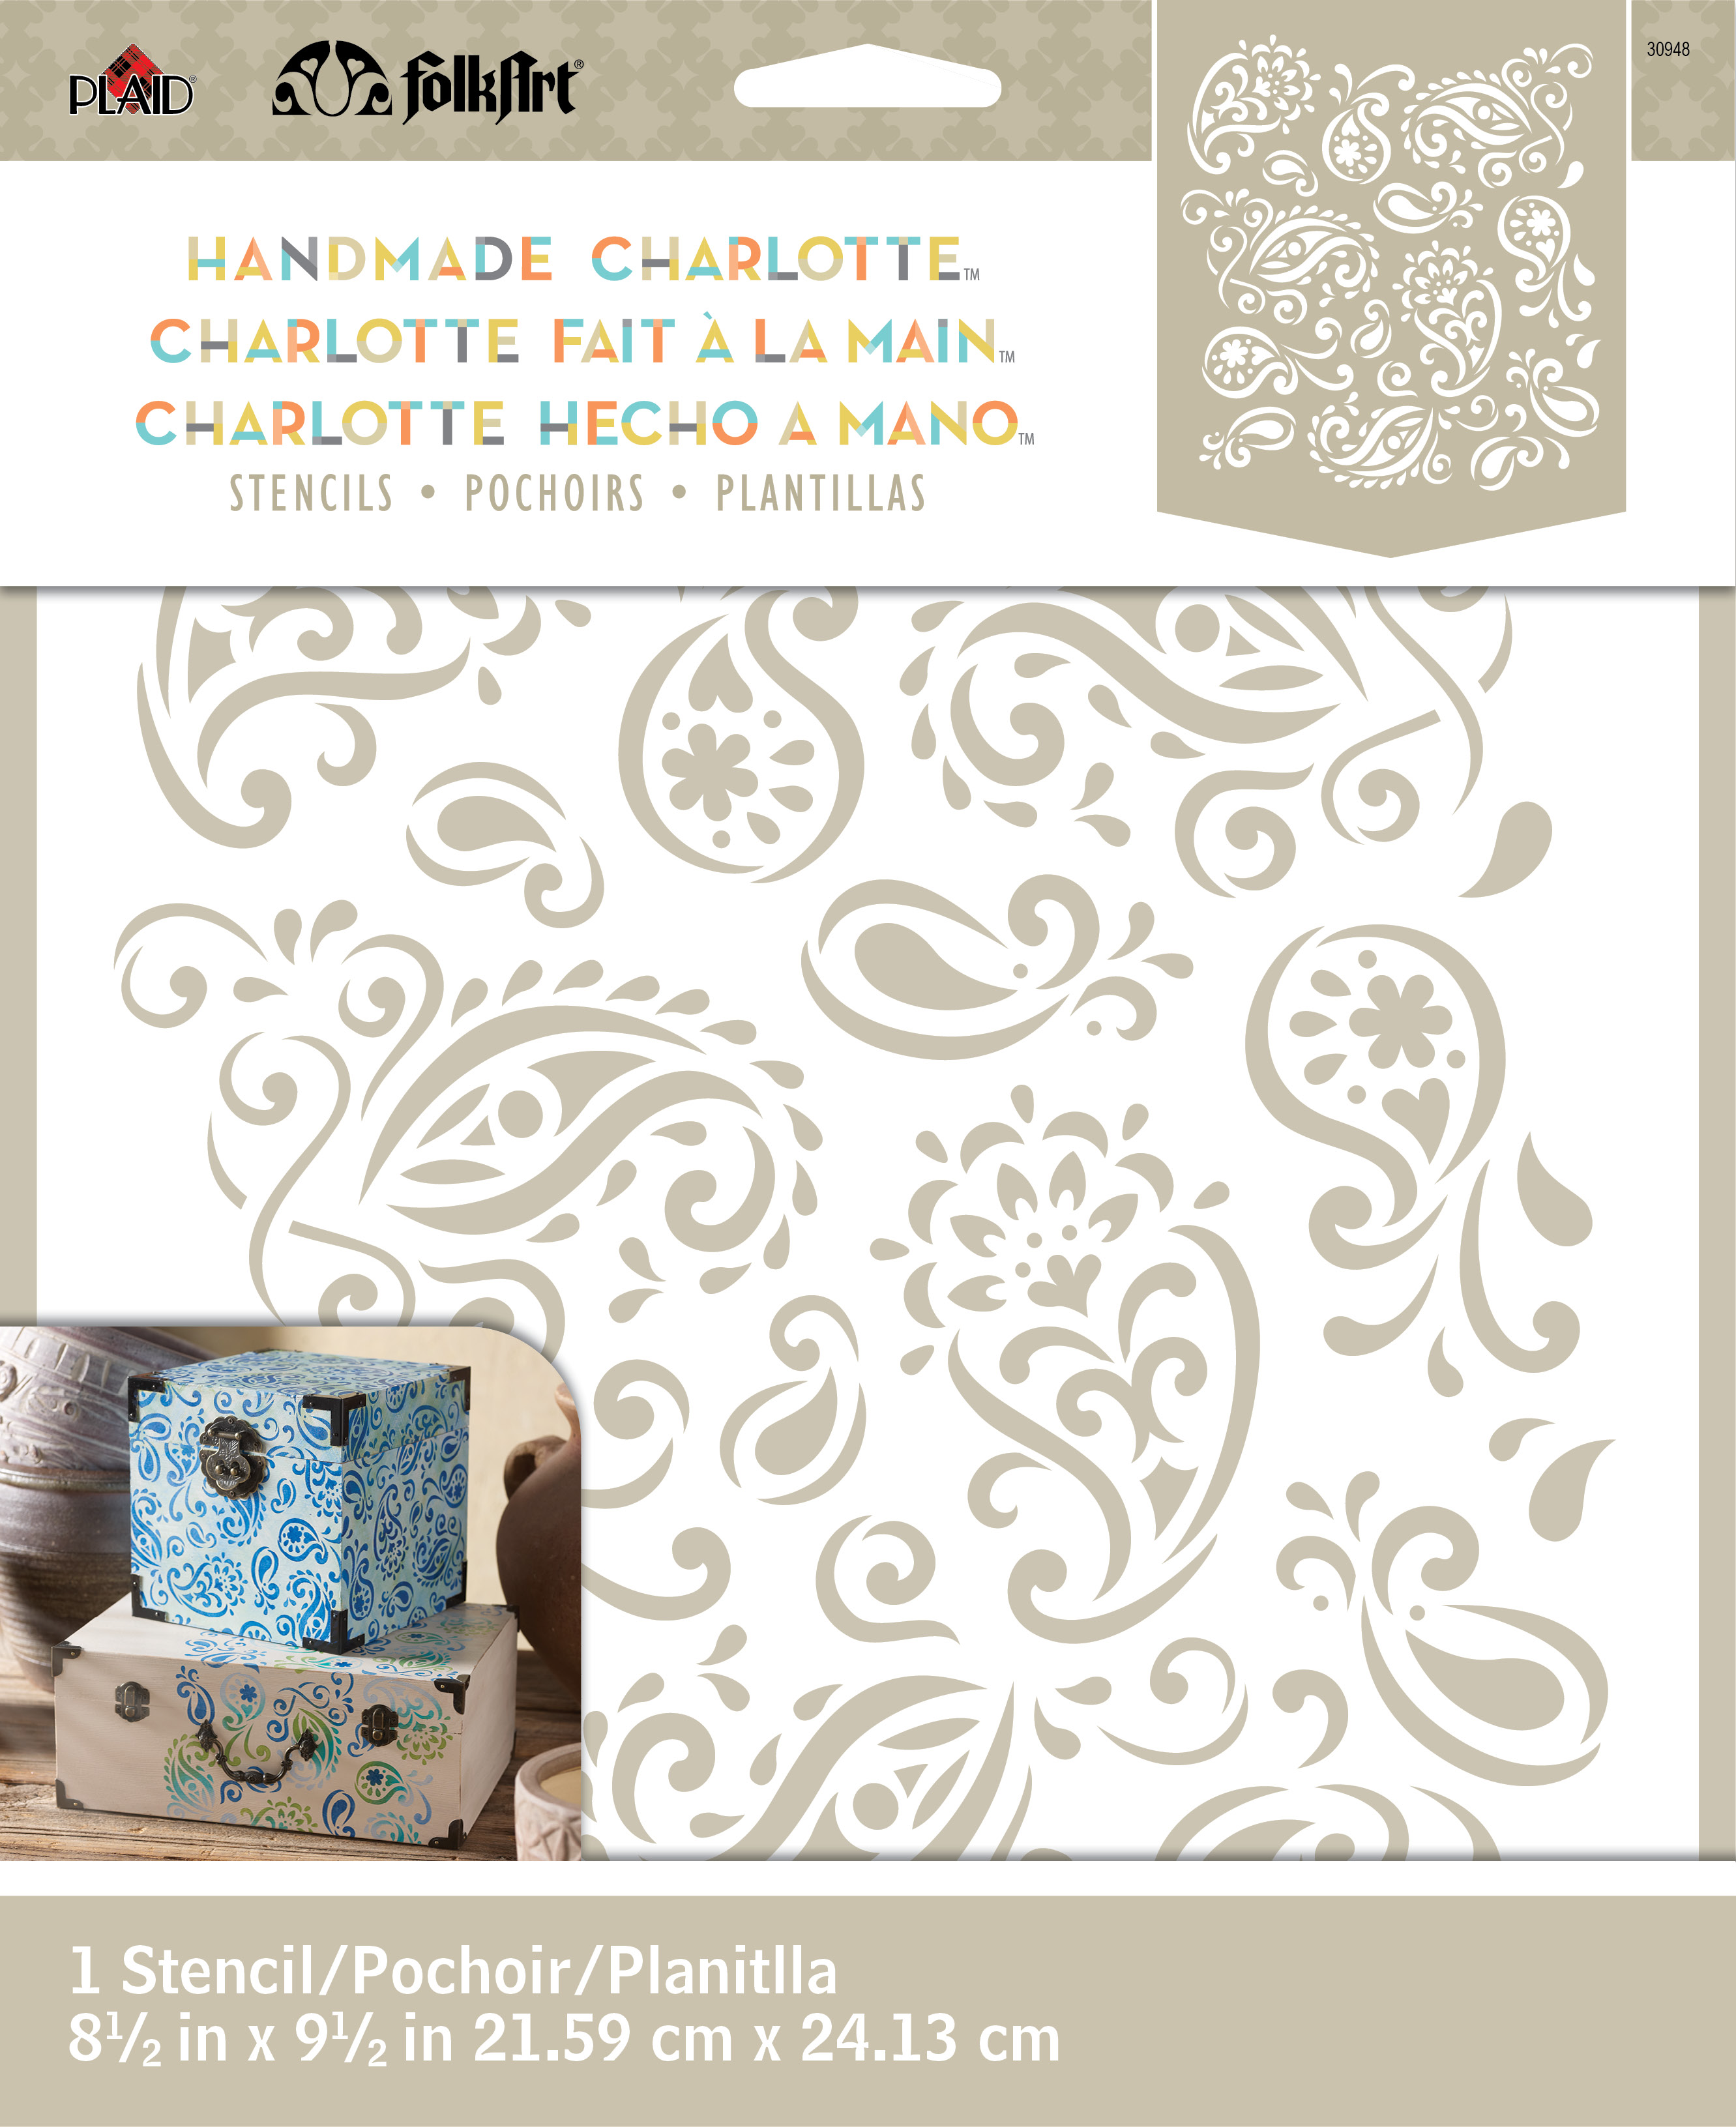 f64e9fe45 FolkArt Handmade Charlotte 8.5''x9.5'' Stencil-Paisley Delight | JOANN